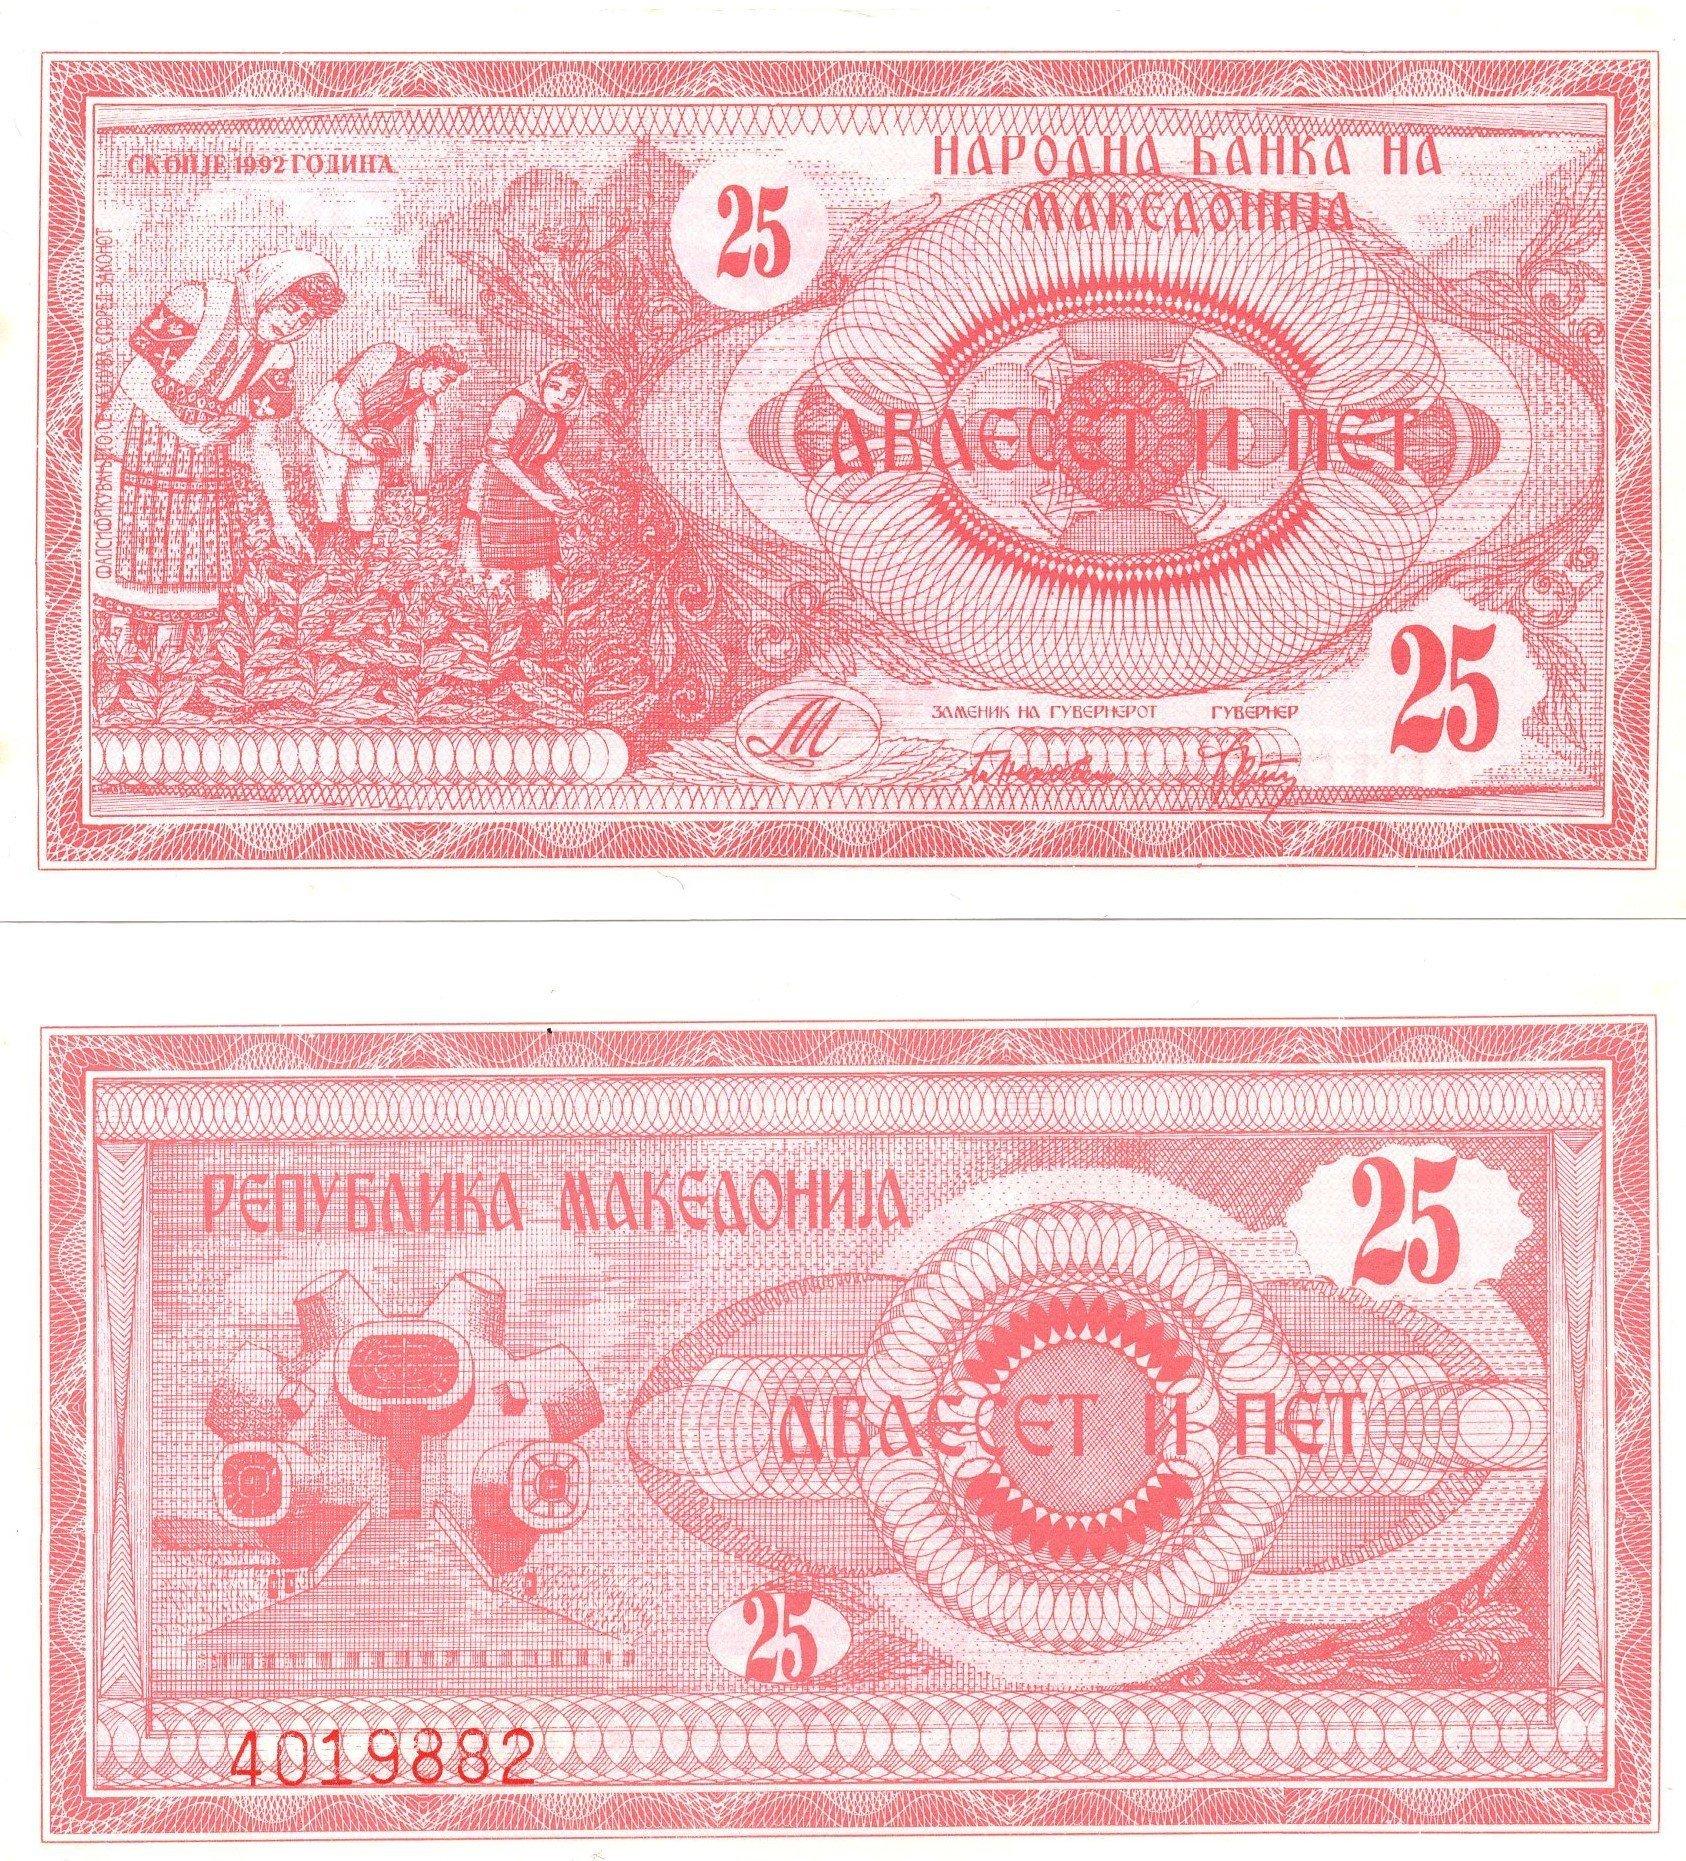 Macedibia 25 dinara 1992 banknote for sale